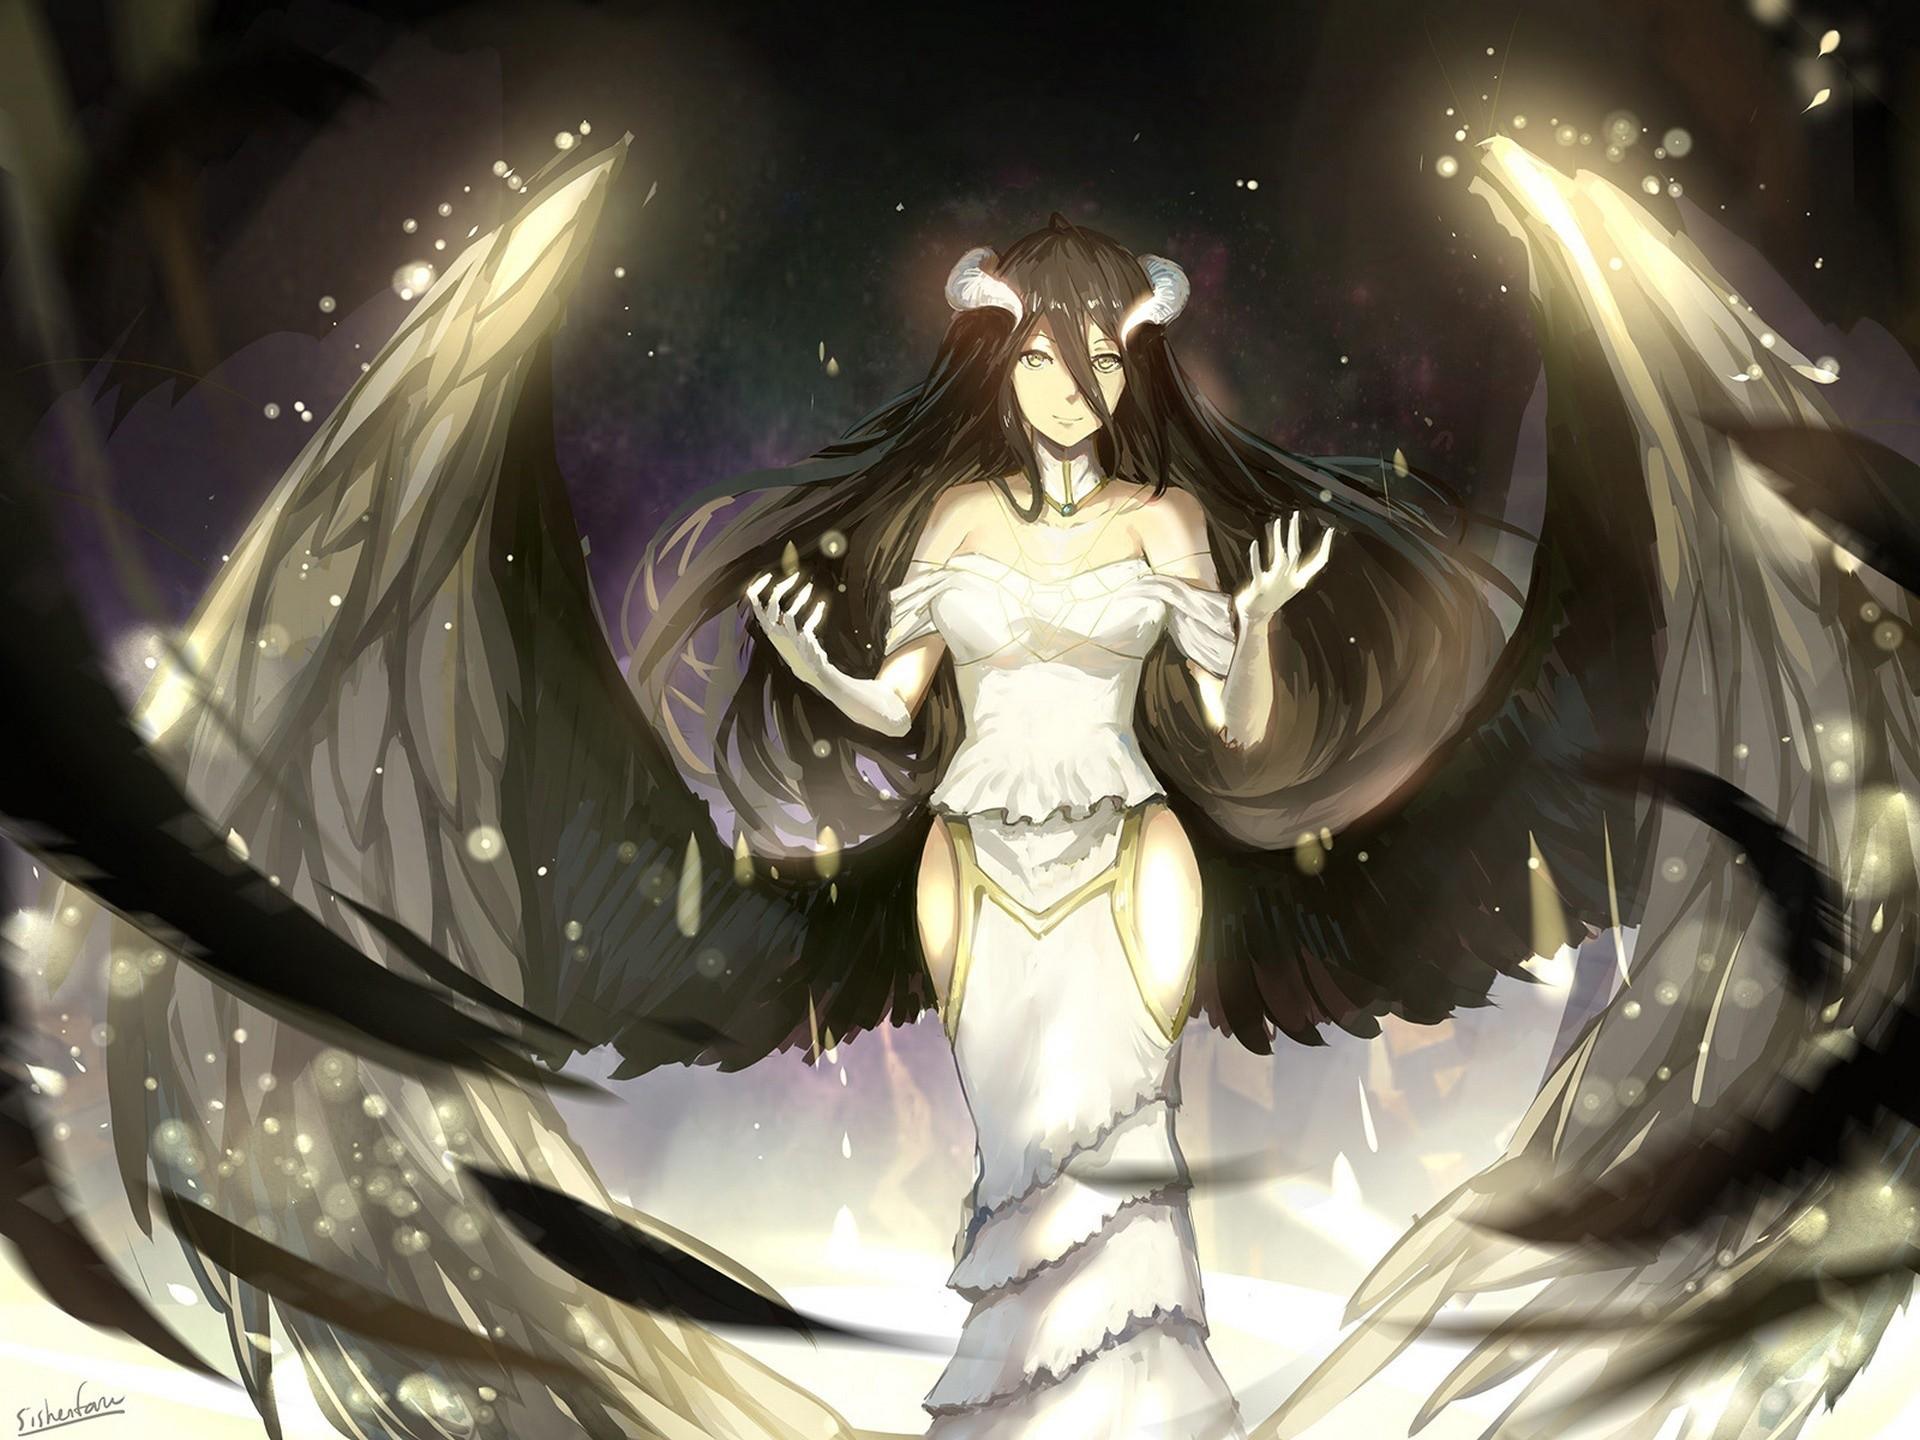 Anime – Overlord Albedo (Overlord) Overlord (Anime) Wallpaper